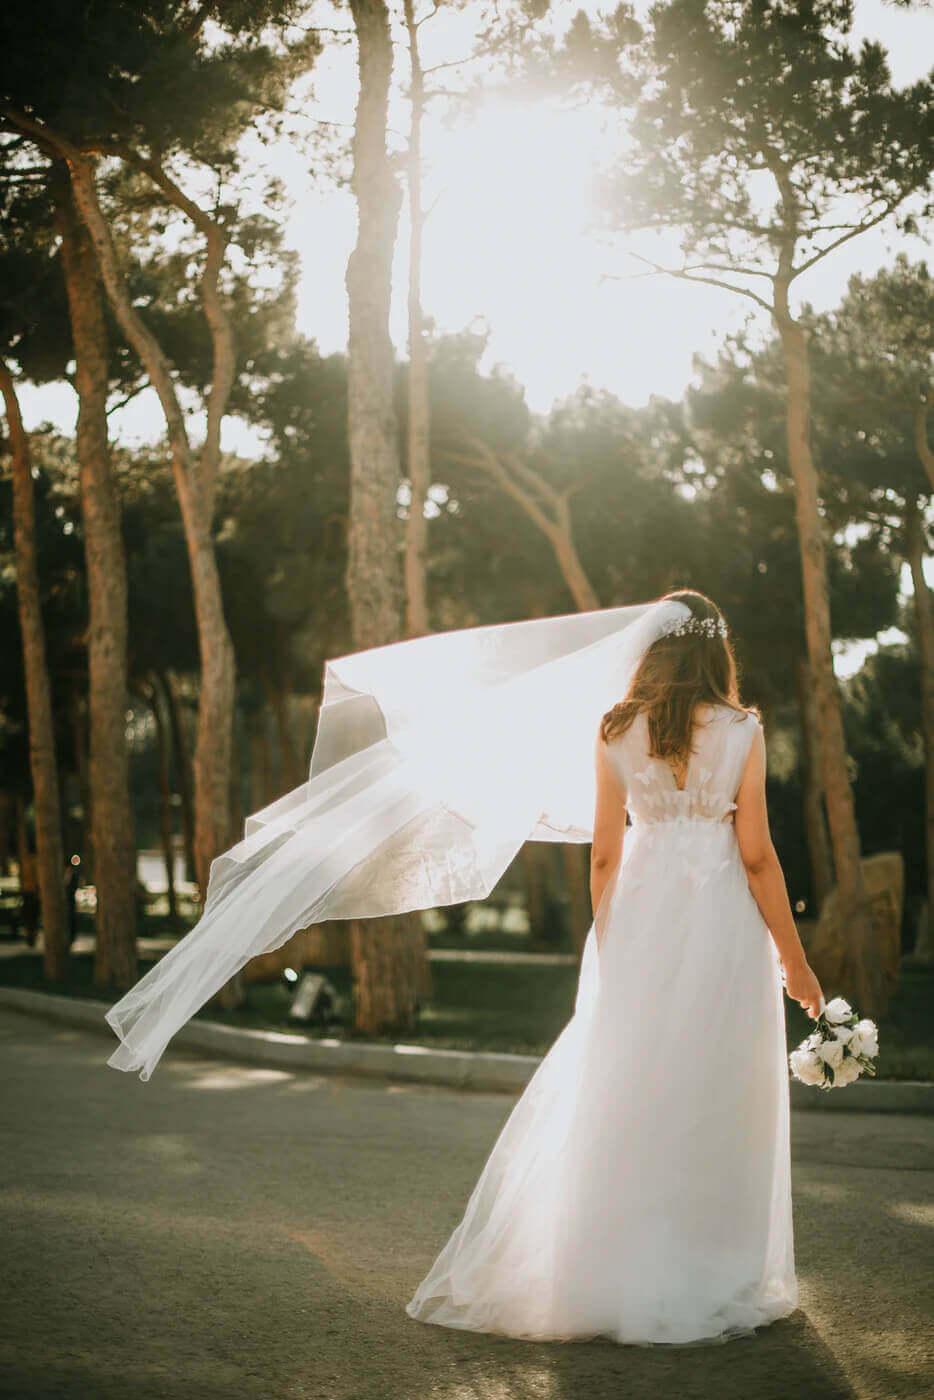 Steps of Western Wedding Ceremony